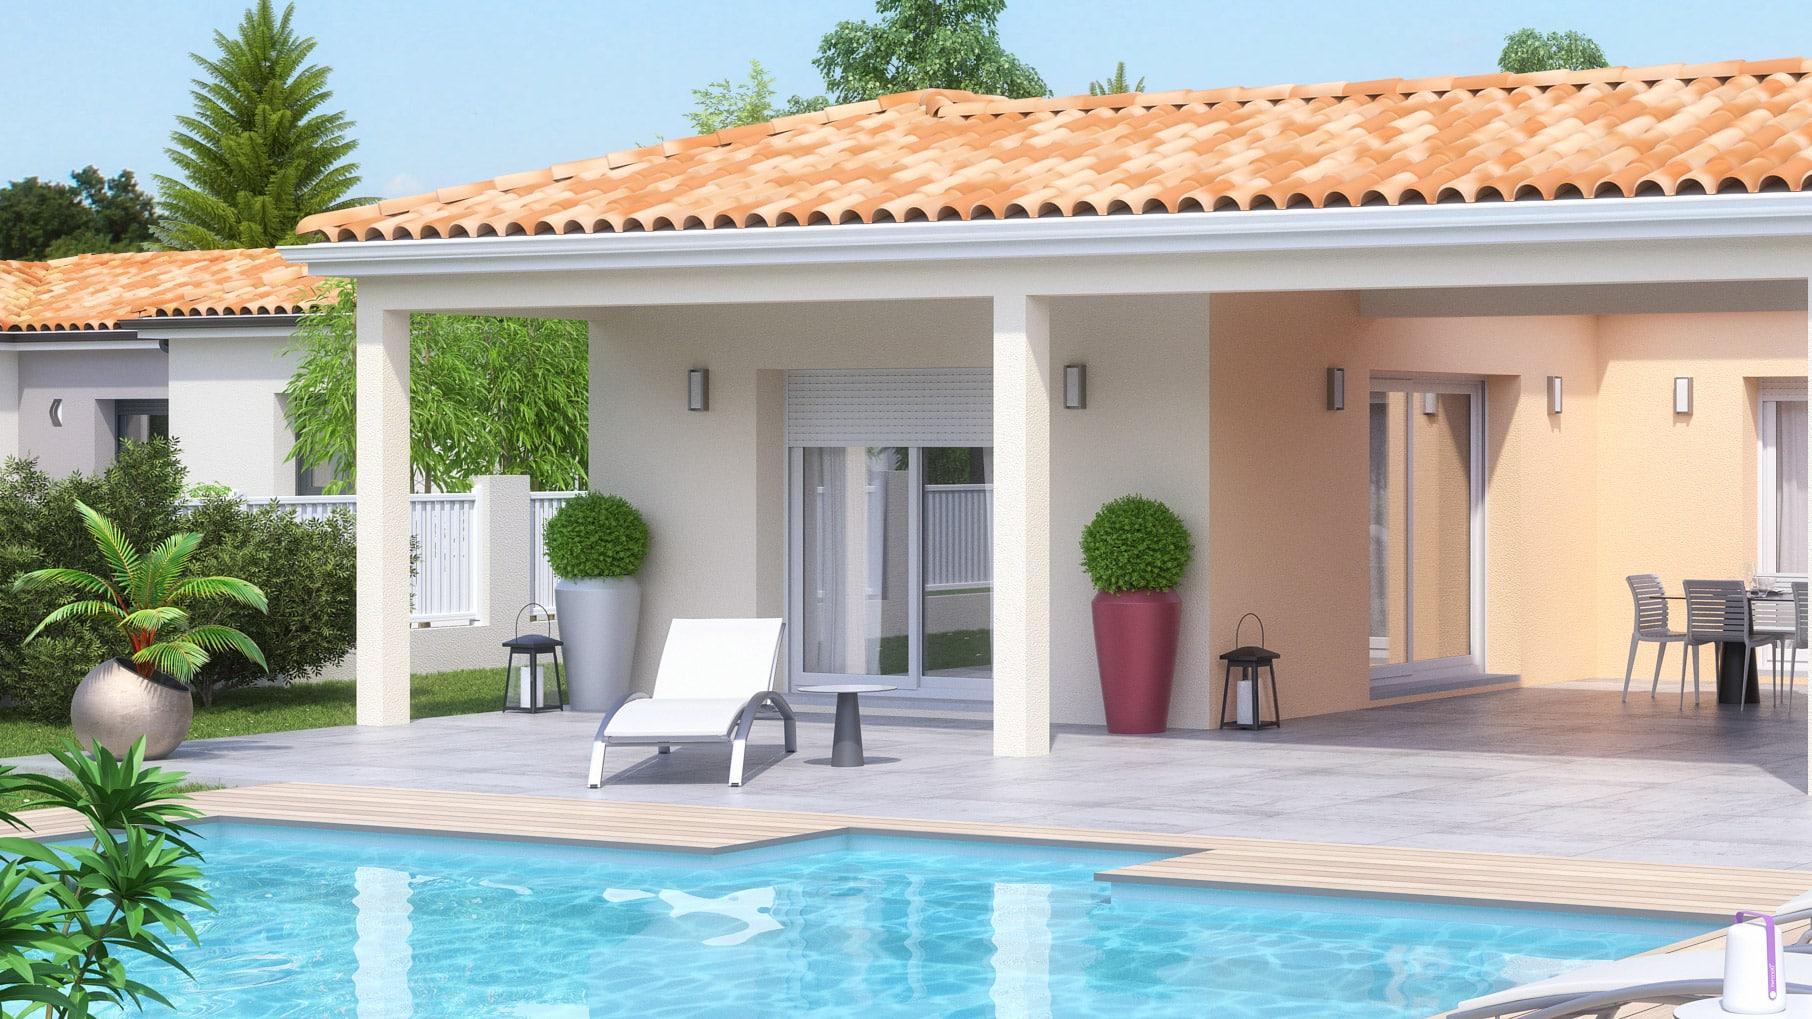 https://www.maisonsclairlogis.fr/wp-content/uploads/volets-roulants-motorises_maison-moderne-joy.jpg